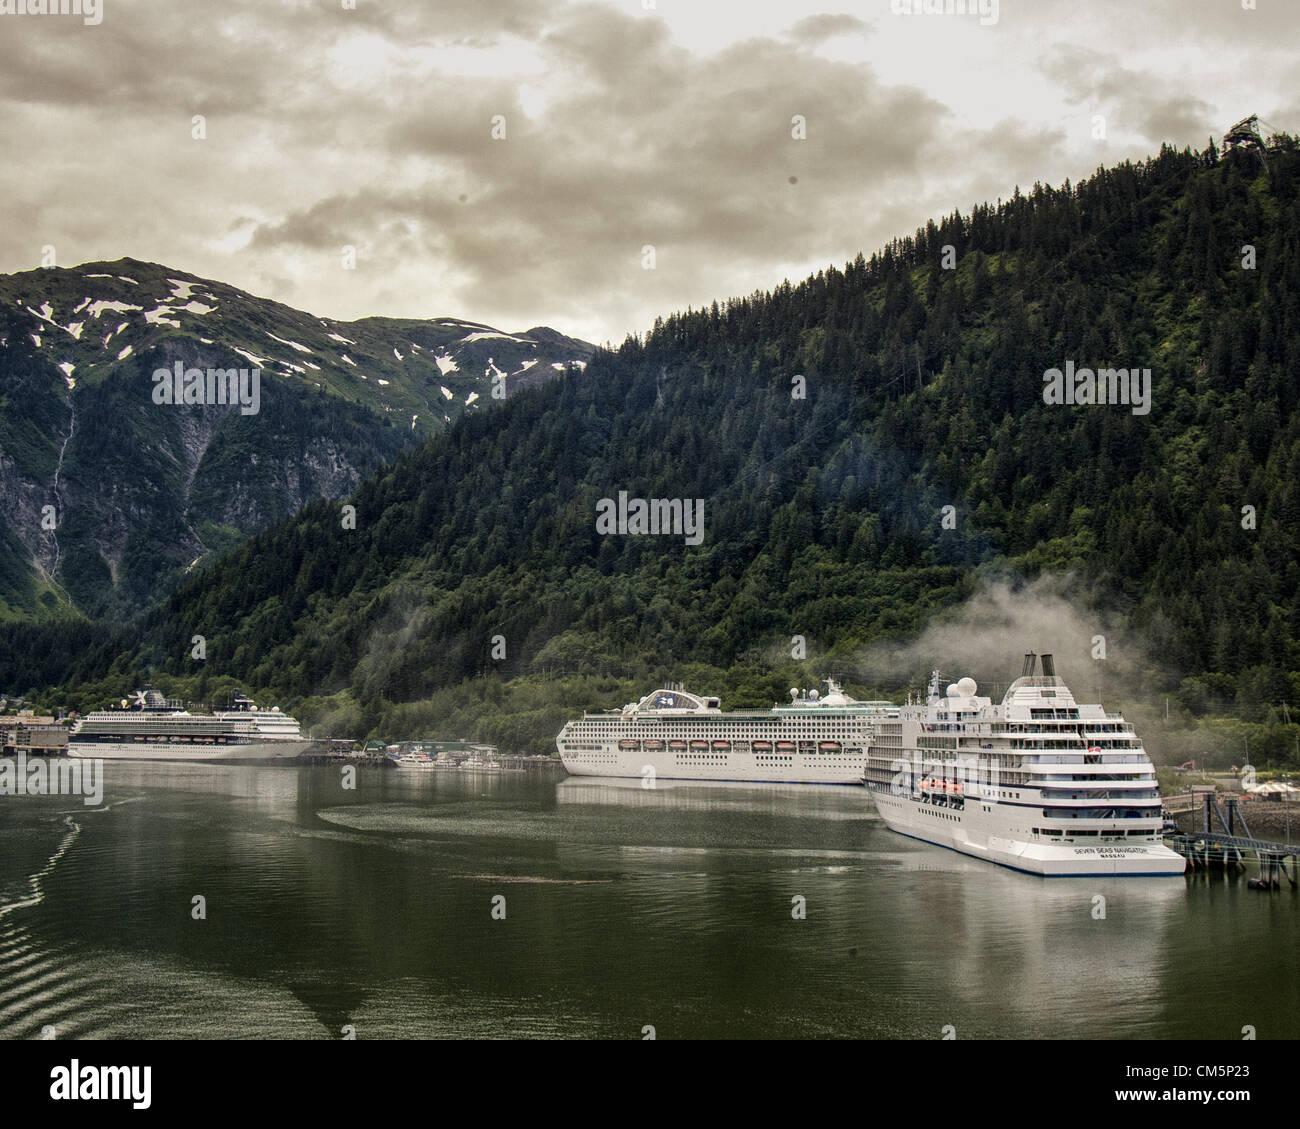 July 5, 2012 - Borough Of Juneau, Alaska, US - The Celebrity Century, Princess Cruises Sea Princess and the Regent - Stock Image